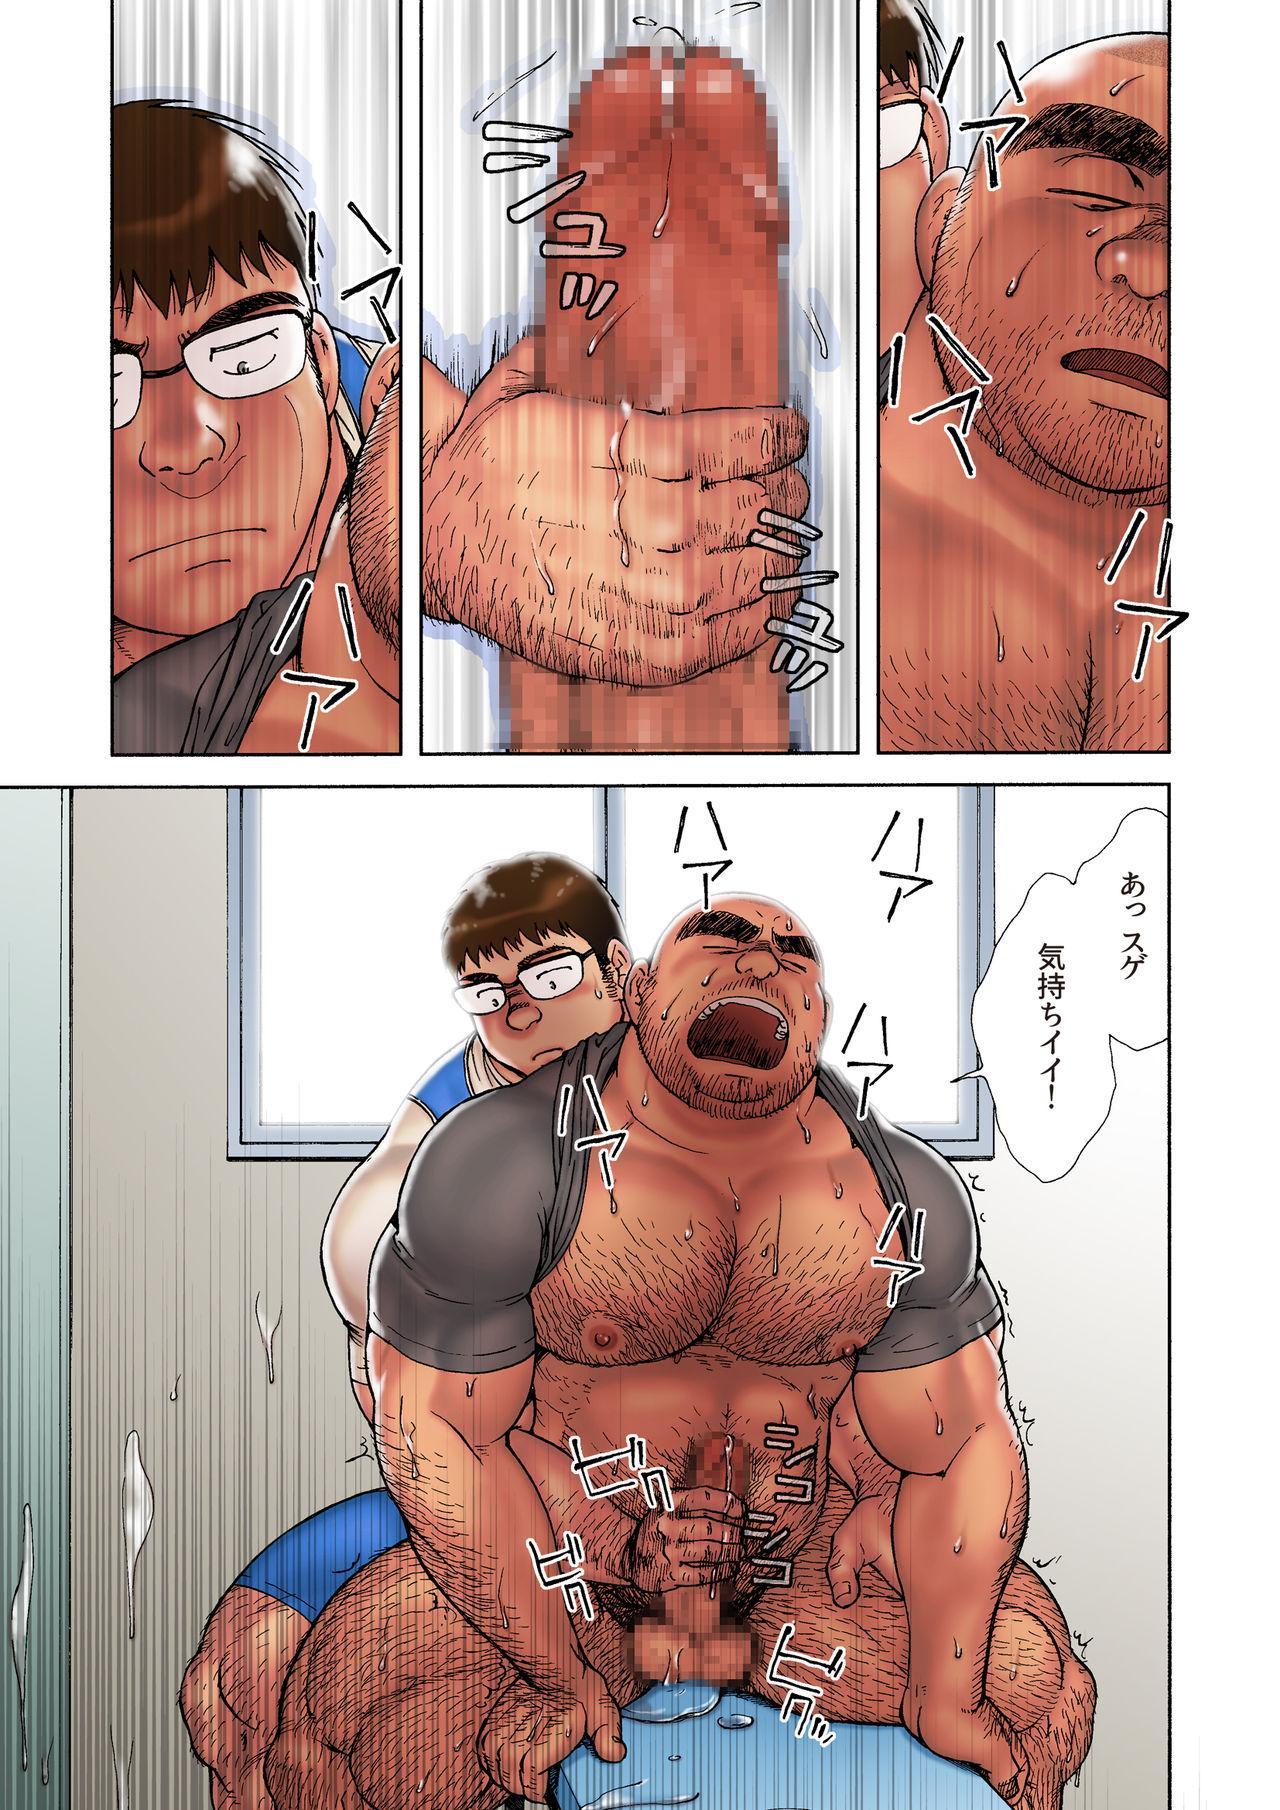 Danshi Koukousei Weightlifter Shiai-chuu, Osae kirenai Wakai Takeri 42